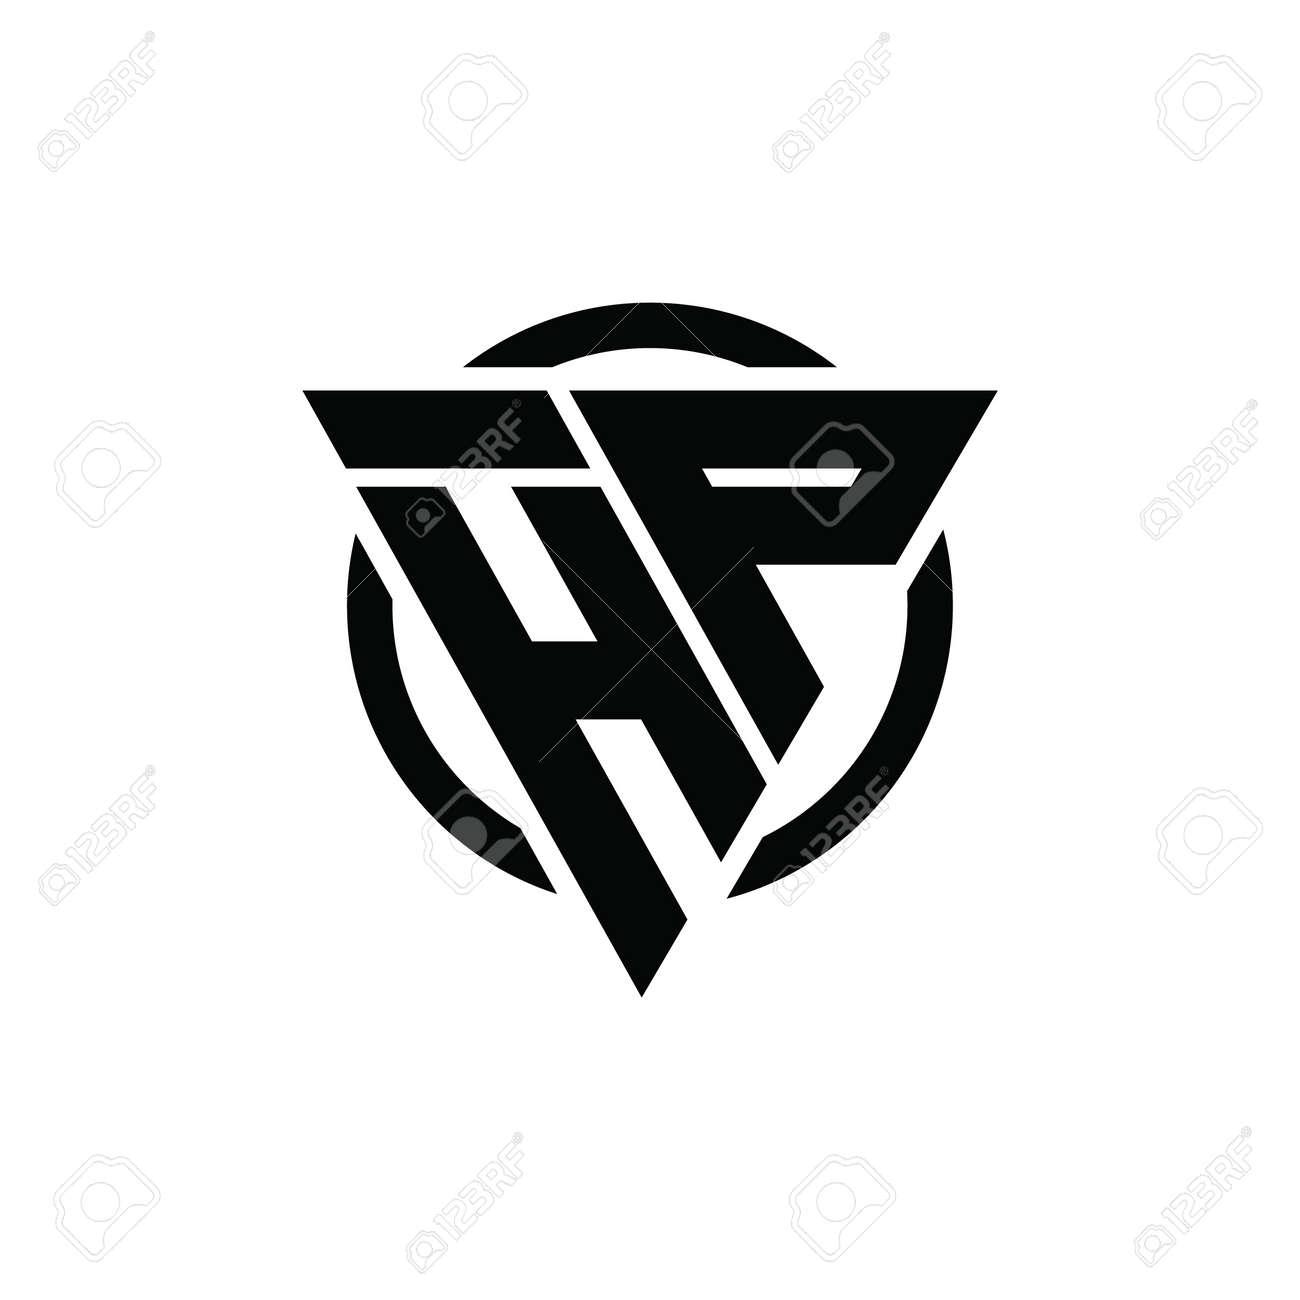 Hp Ph Triangle Logo Circle Monogram Design Vector Super Hero Royalty Free Cliparts Vectors And Stock Illustration Image 136668672